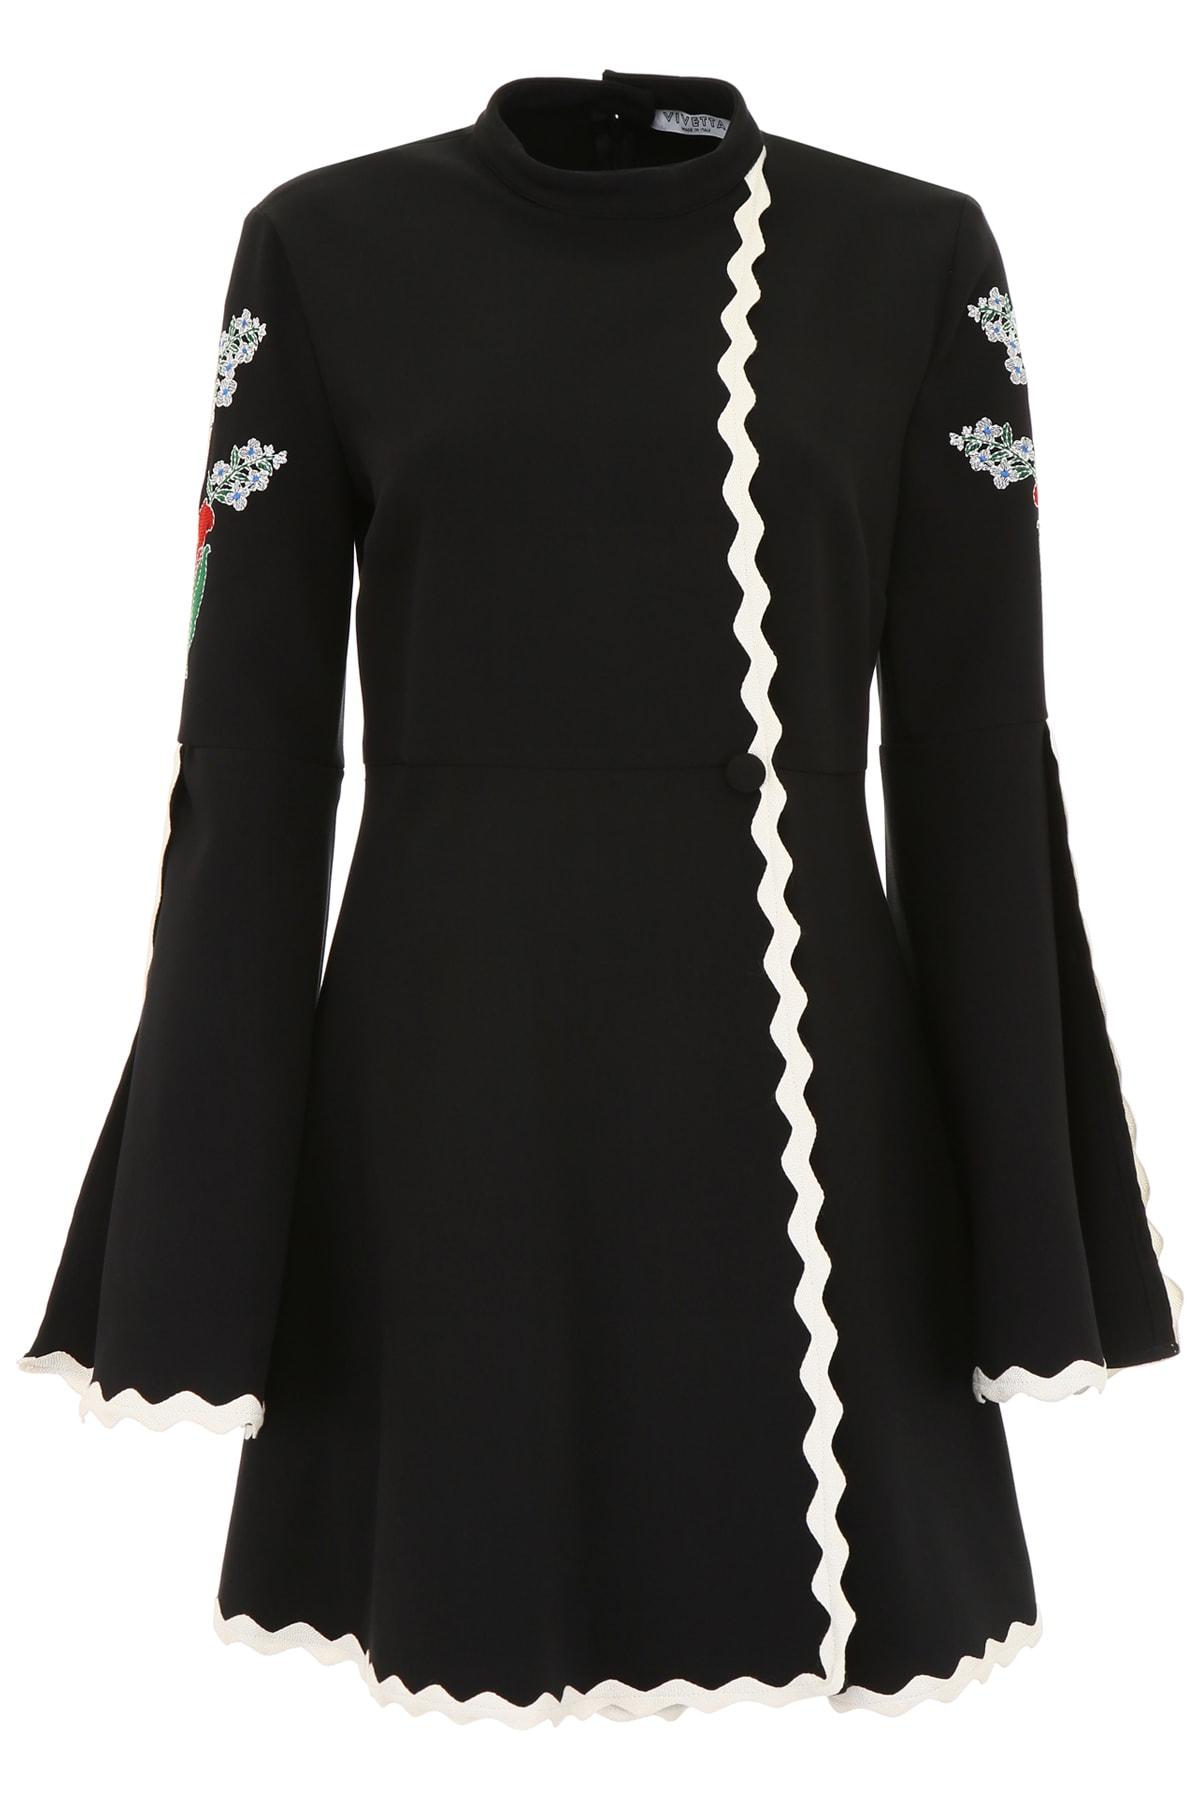 Photo of  Vivetta Embroidered Isabey Dress- shop Vivetta  online sales